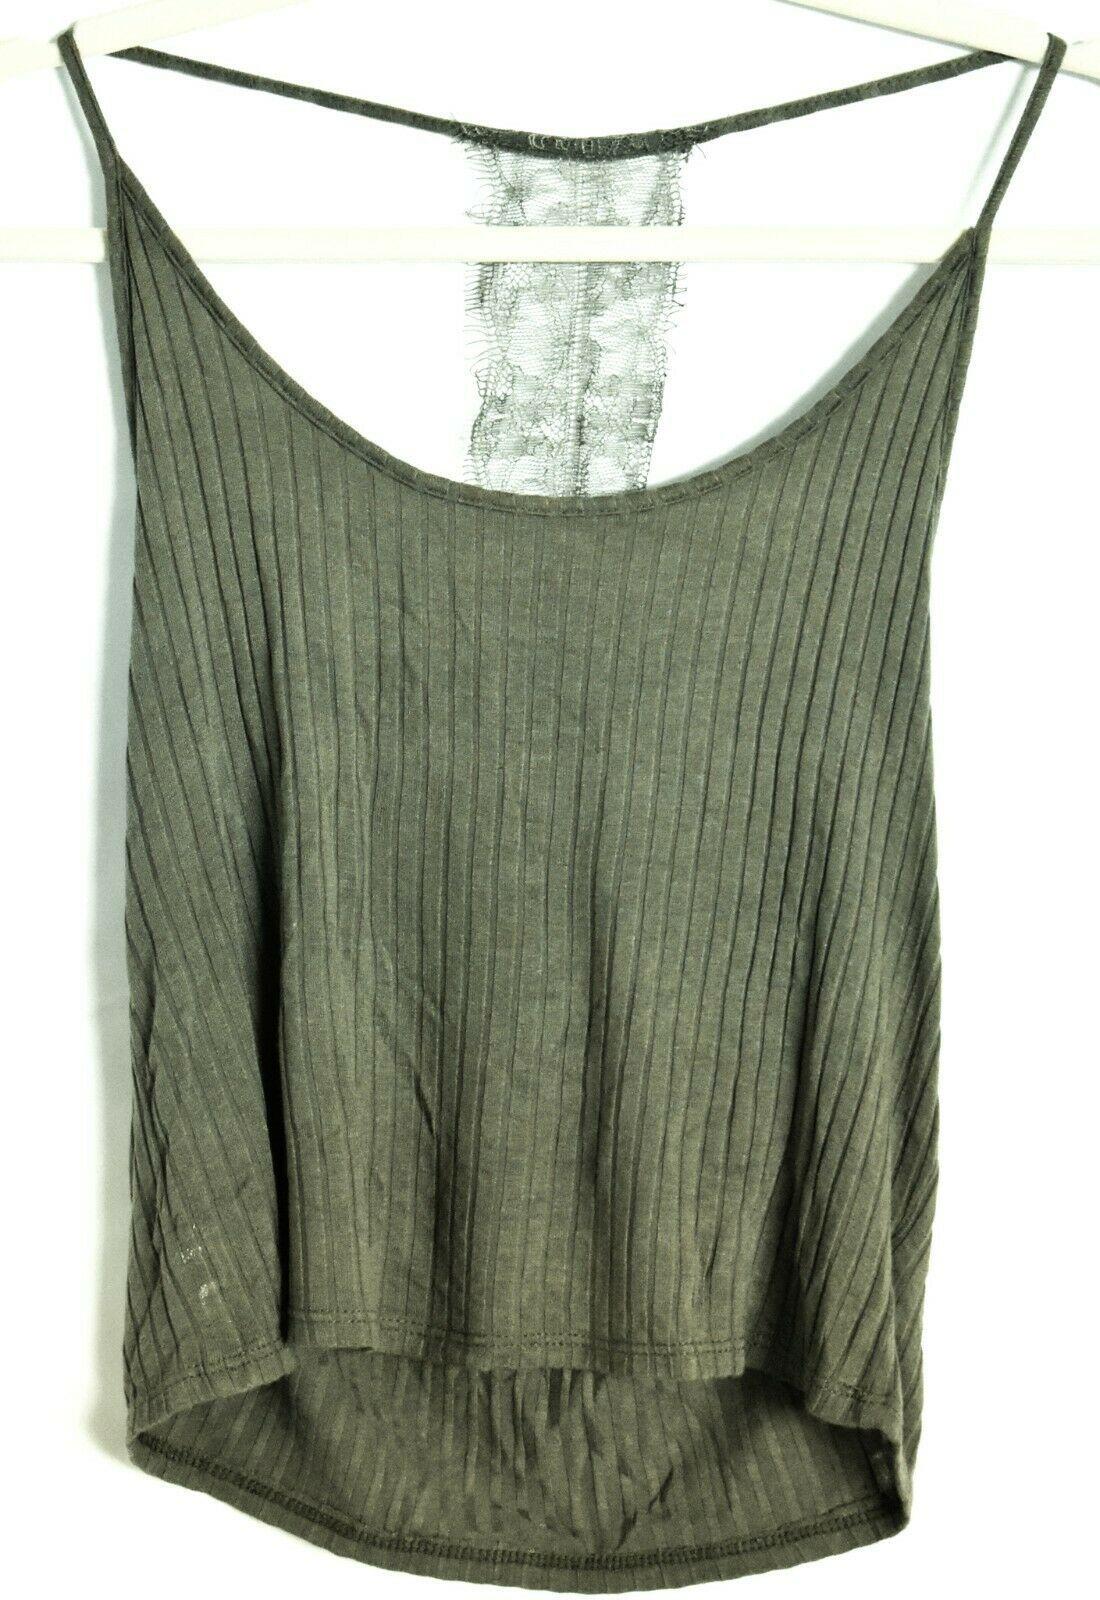 Fashion Nova Olive Green Lace Back Spaghetti Strap Cami Tank Top Size M